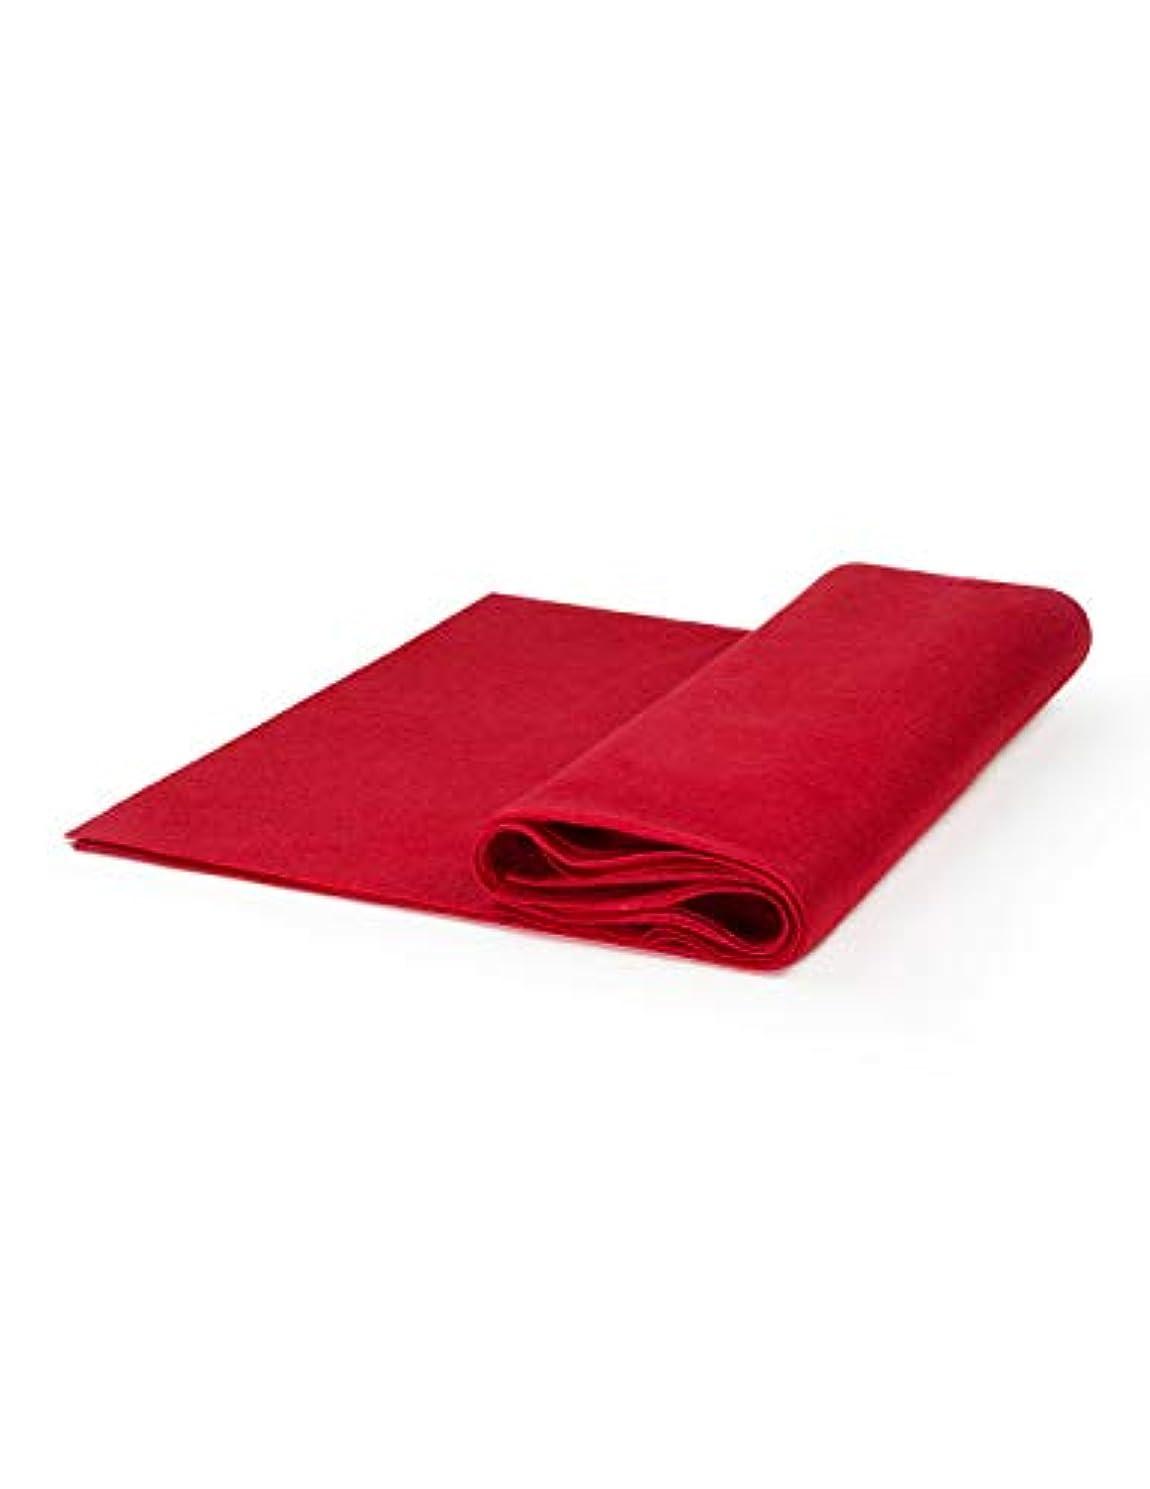 Red Acrylic Felt - 72